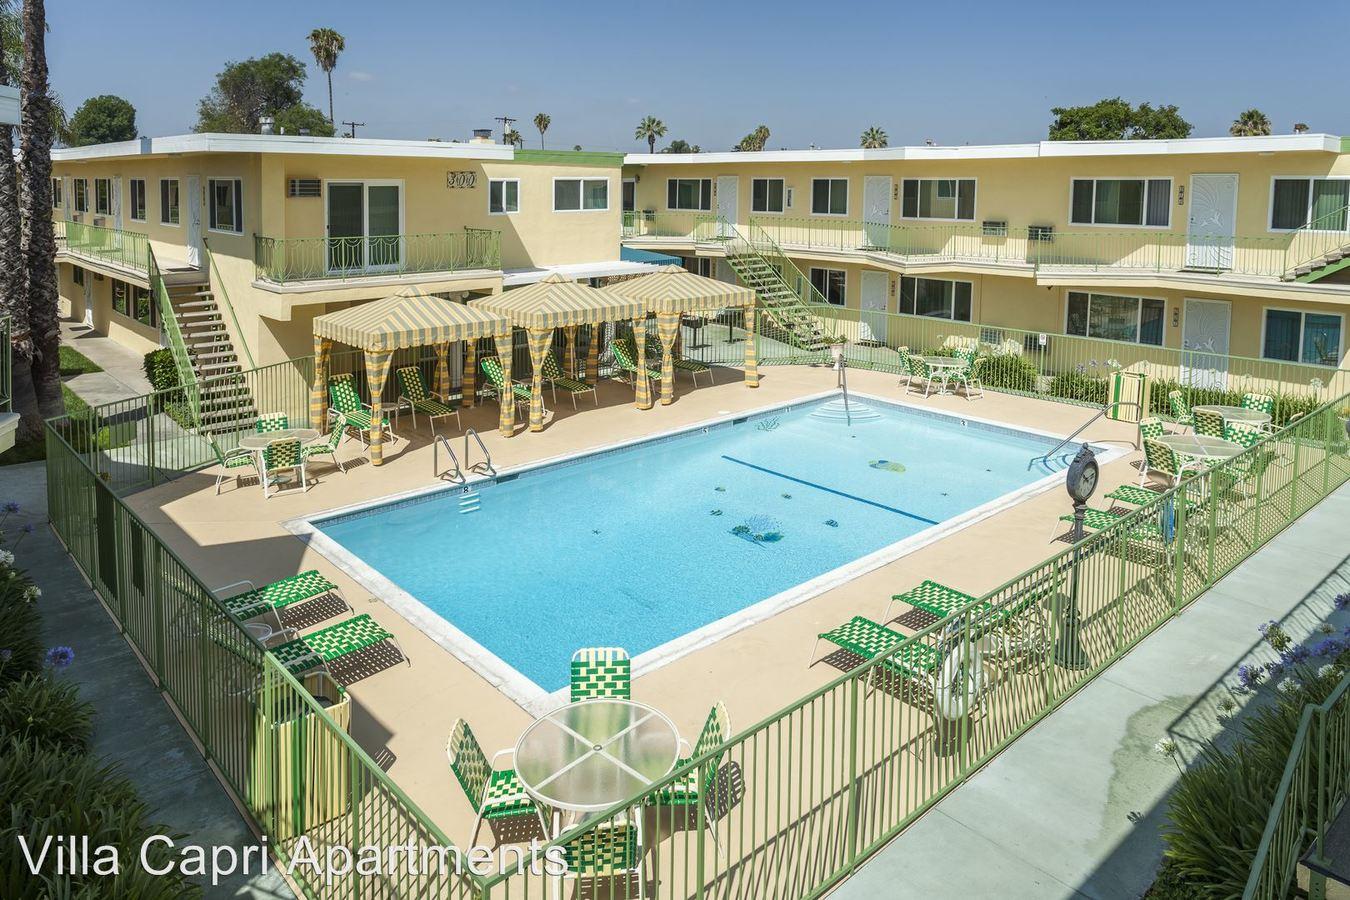 2 Bedrooms 1 Bathroom Apartment for rent at 14220 Francisquito Avenue in Baldwin Park, CA